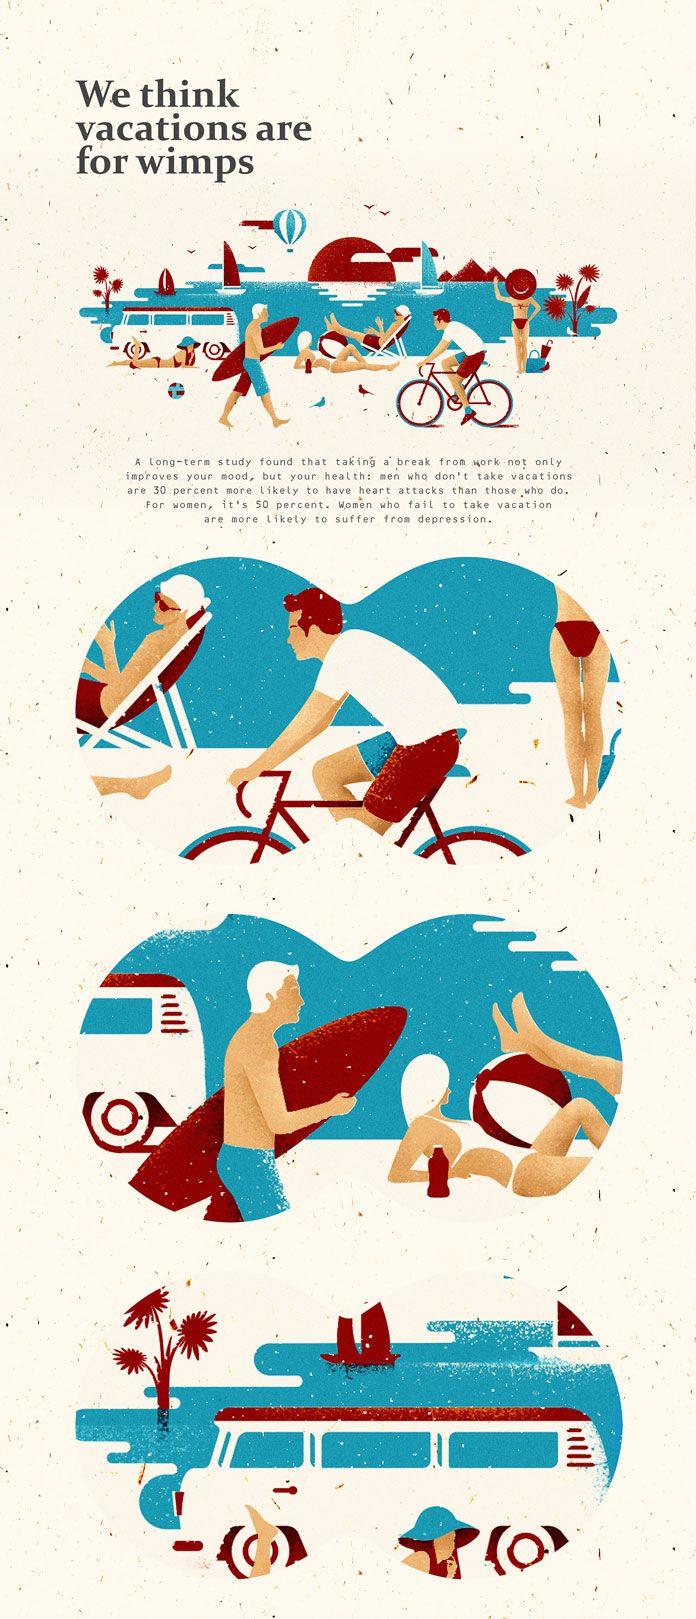 Beach illustrations | Editorial illustrations by Andriy Muzichka